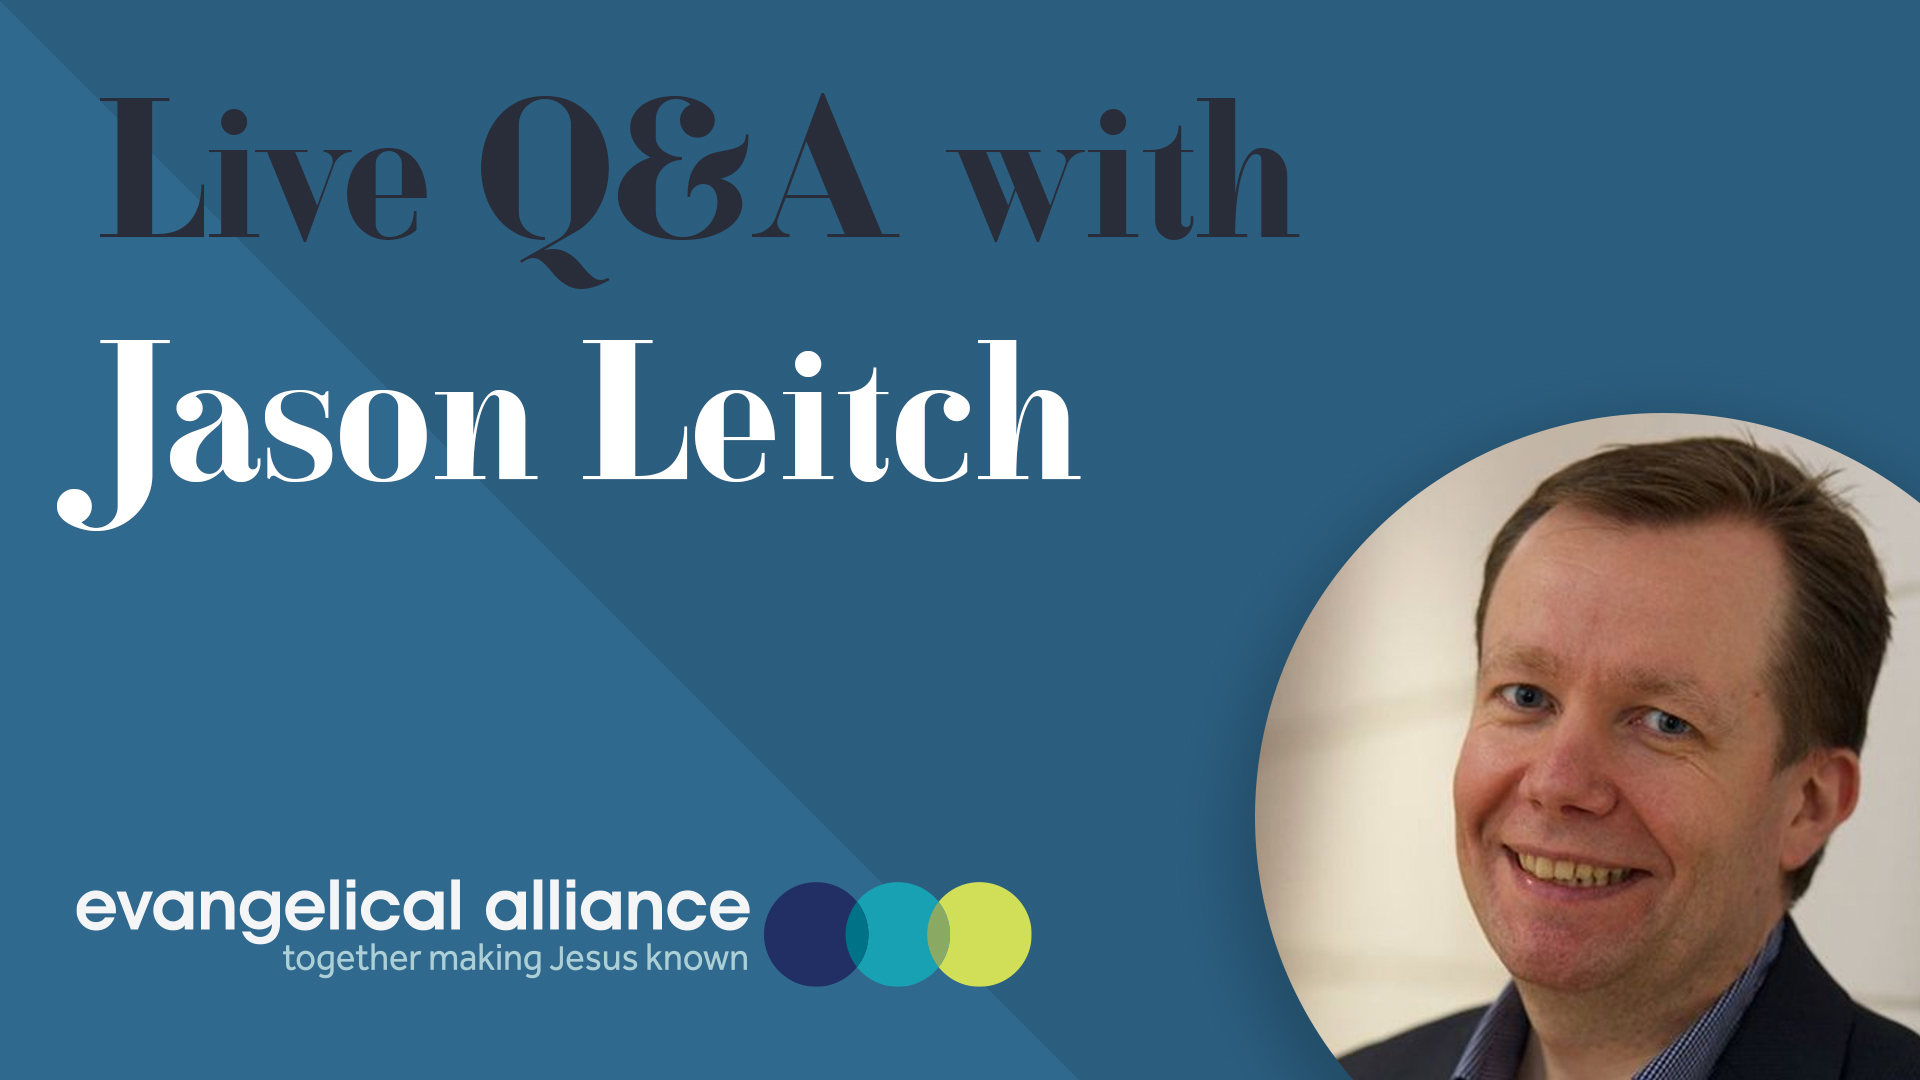 QA with Jason Leitch